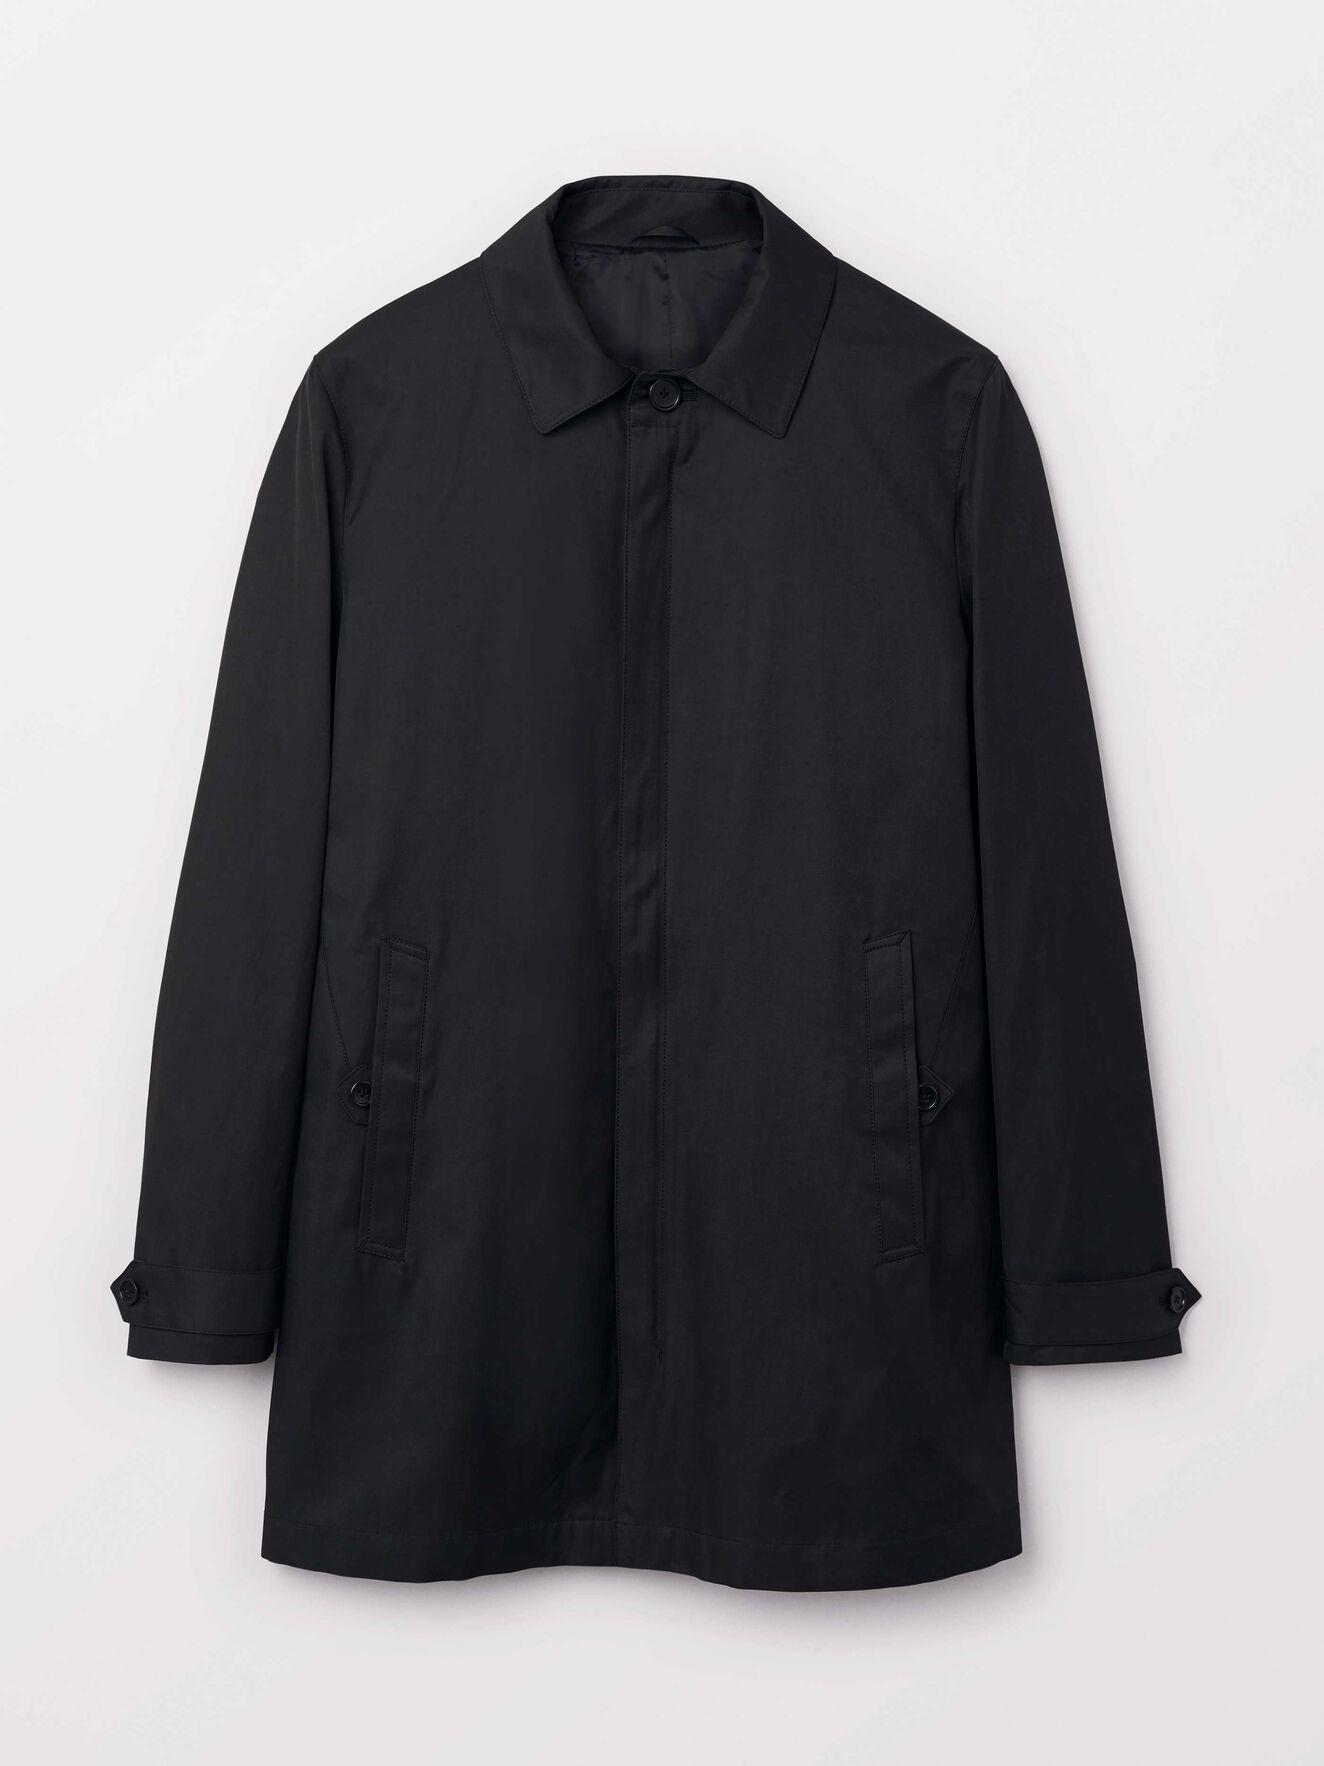 Carred Z Coat in Black from Tiger of Sweden